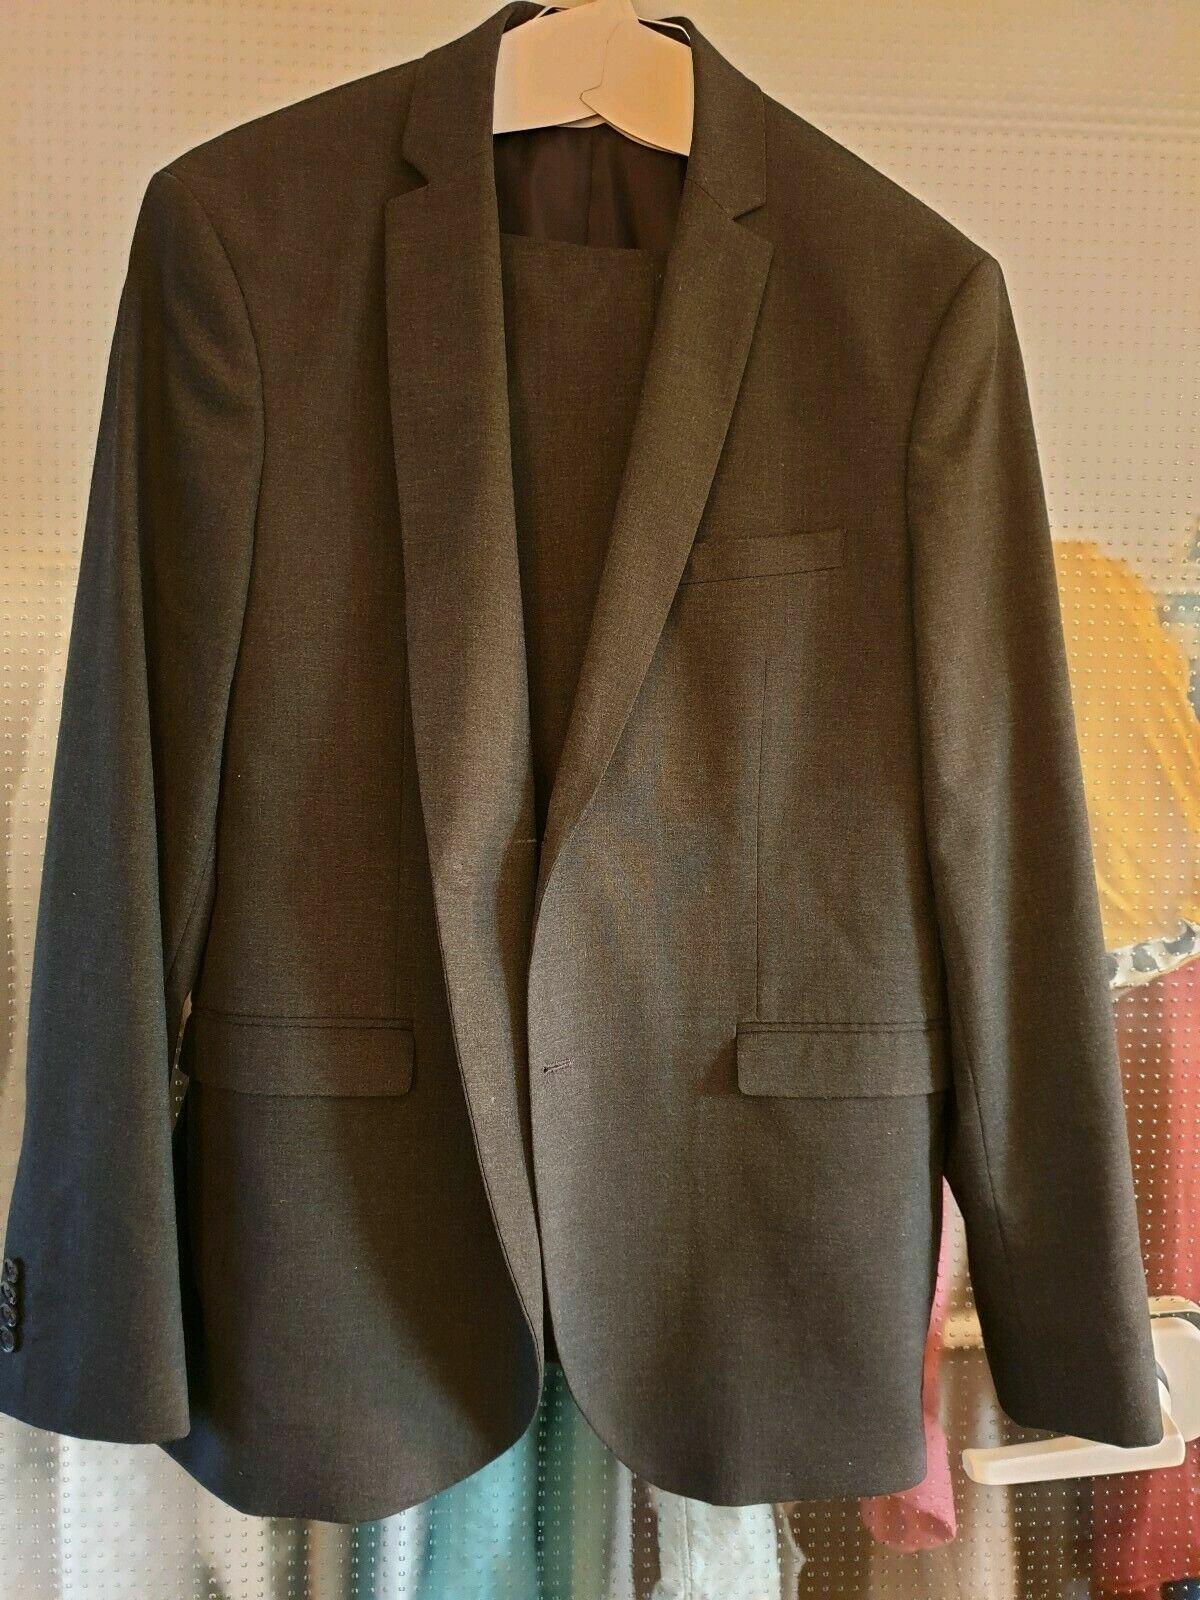 Jack & Jones Premium, Anzug, Herren, 52u. 54  Grau,  Slim fit, TOP !!!